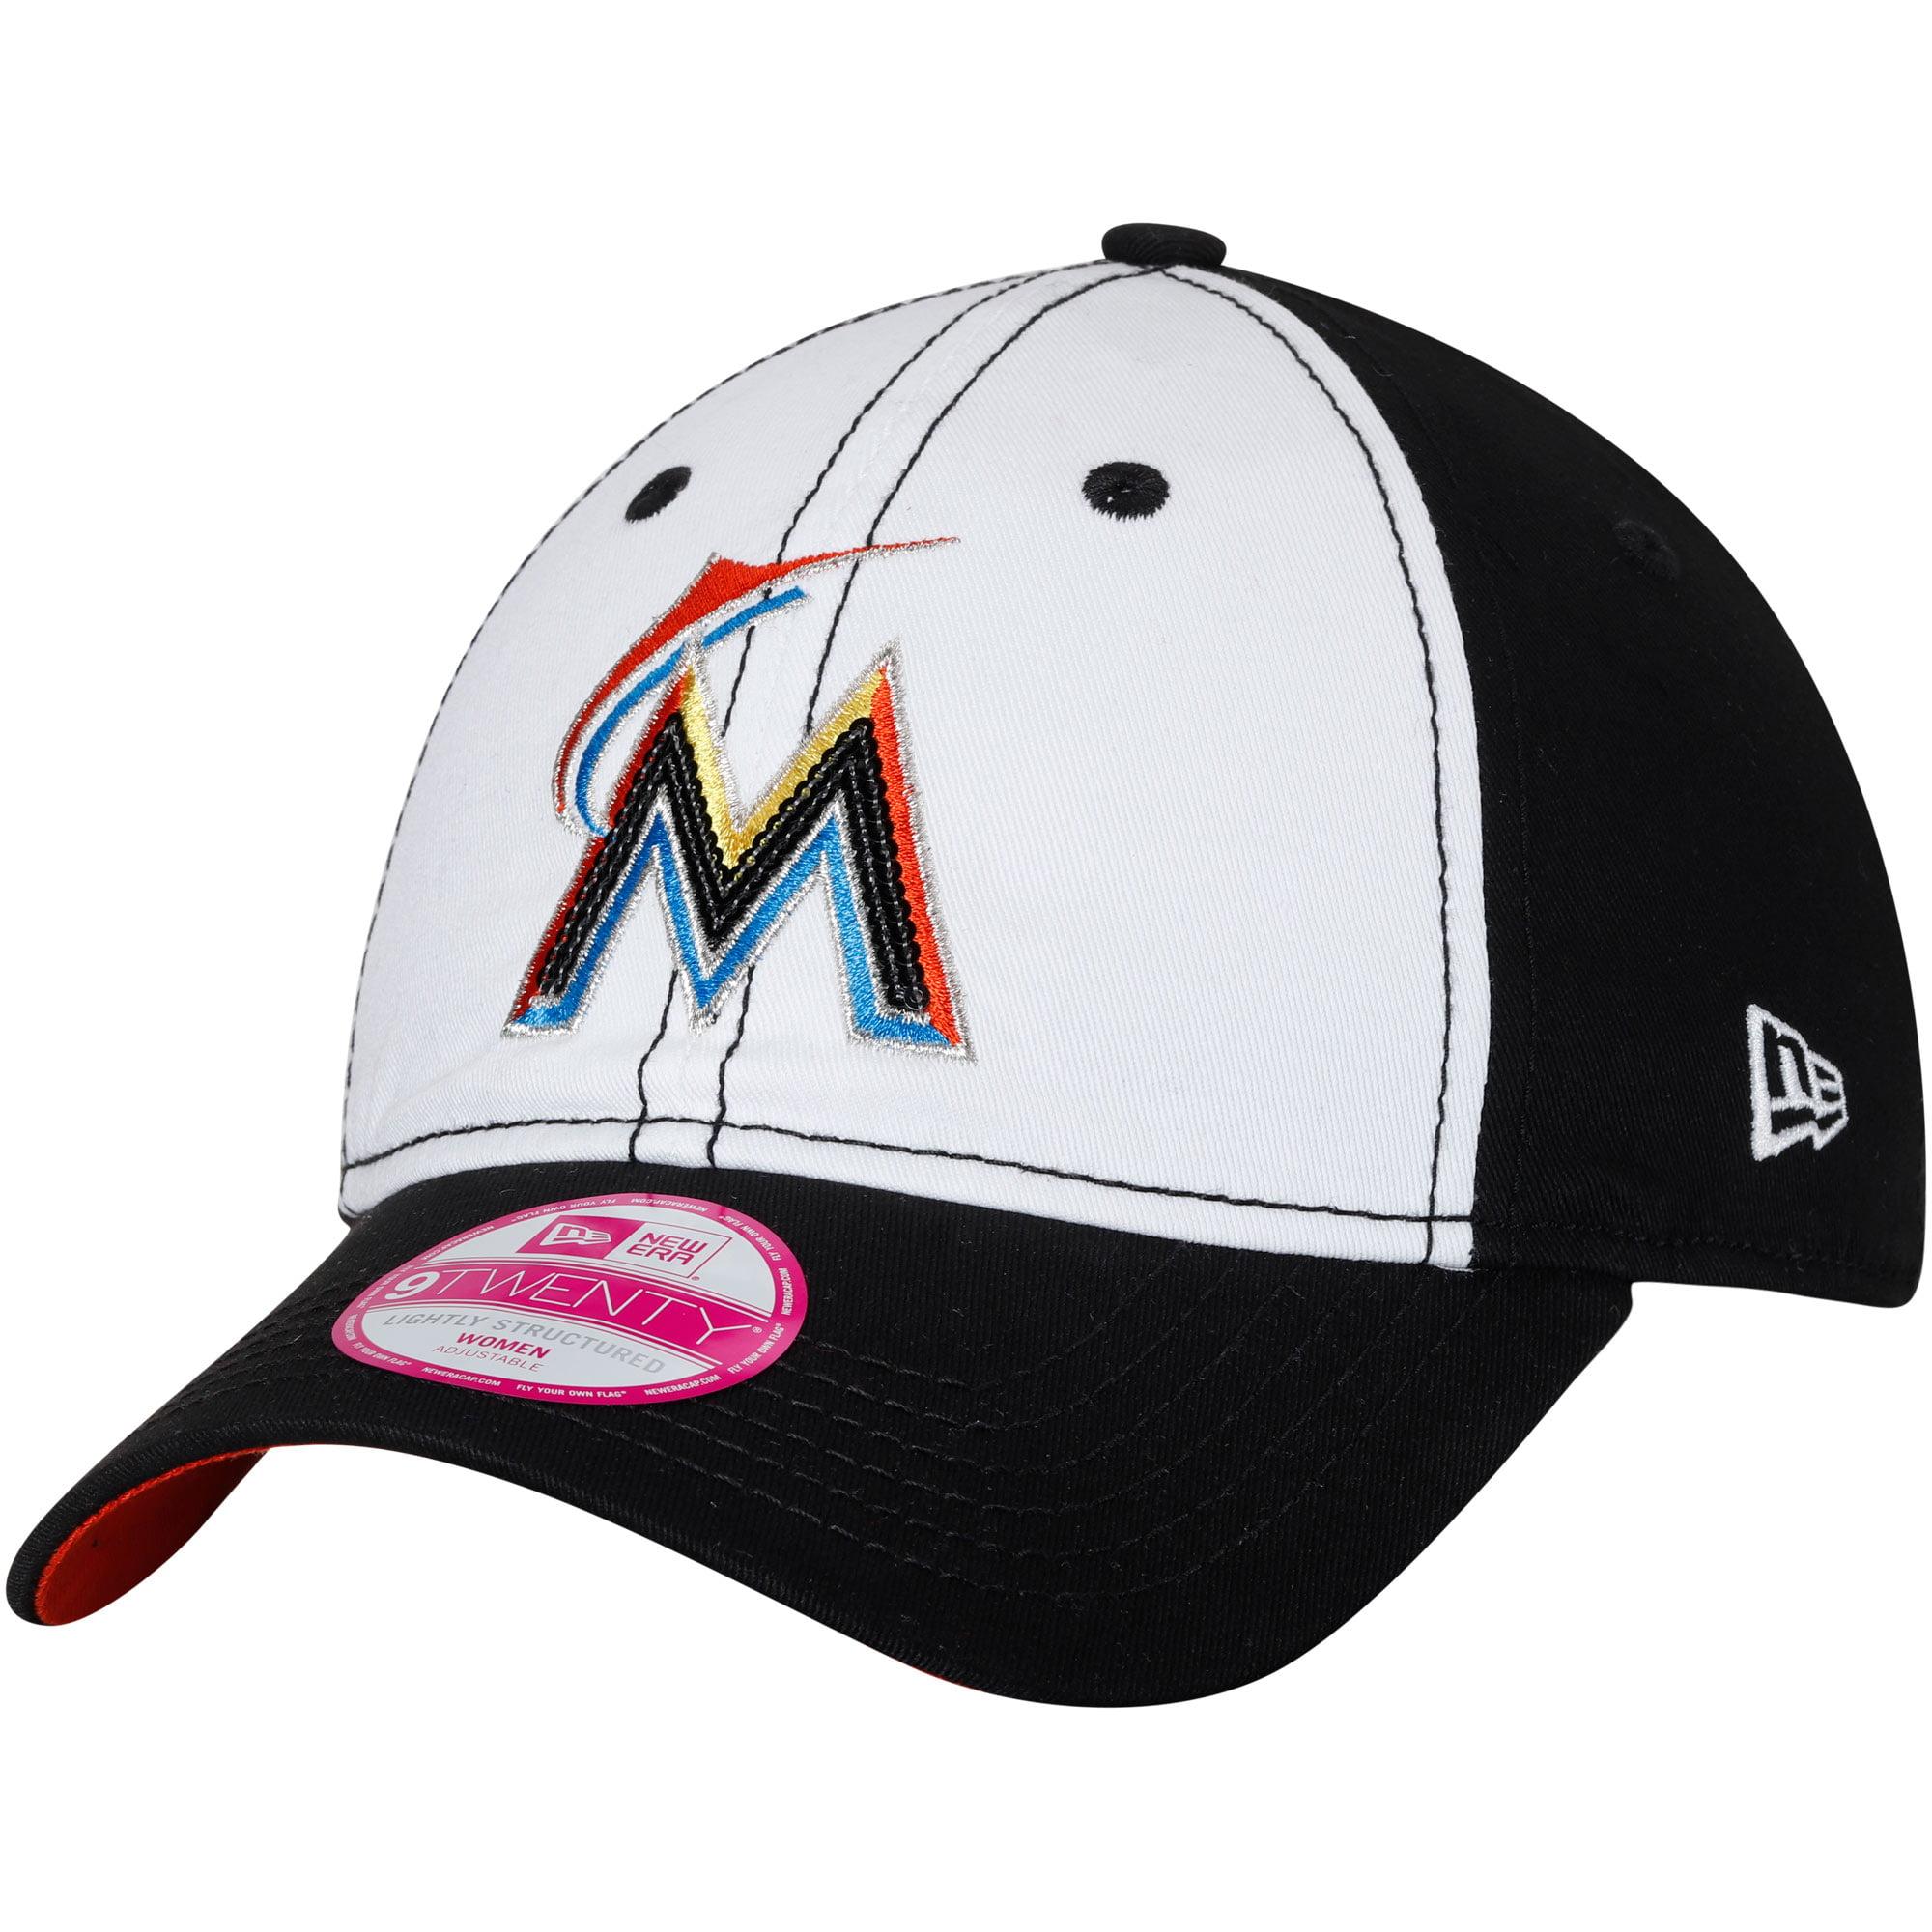 Miami Marlins New Era Women's Team Glimmer 9TWENTY Adjustable Hat - White/Black - OSFA